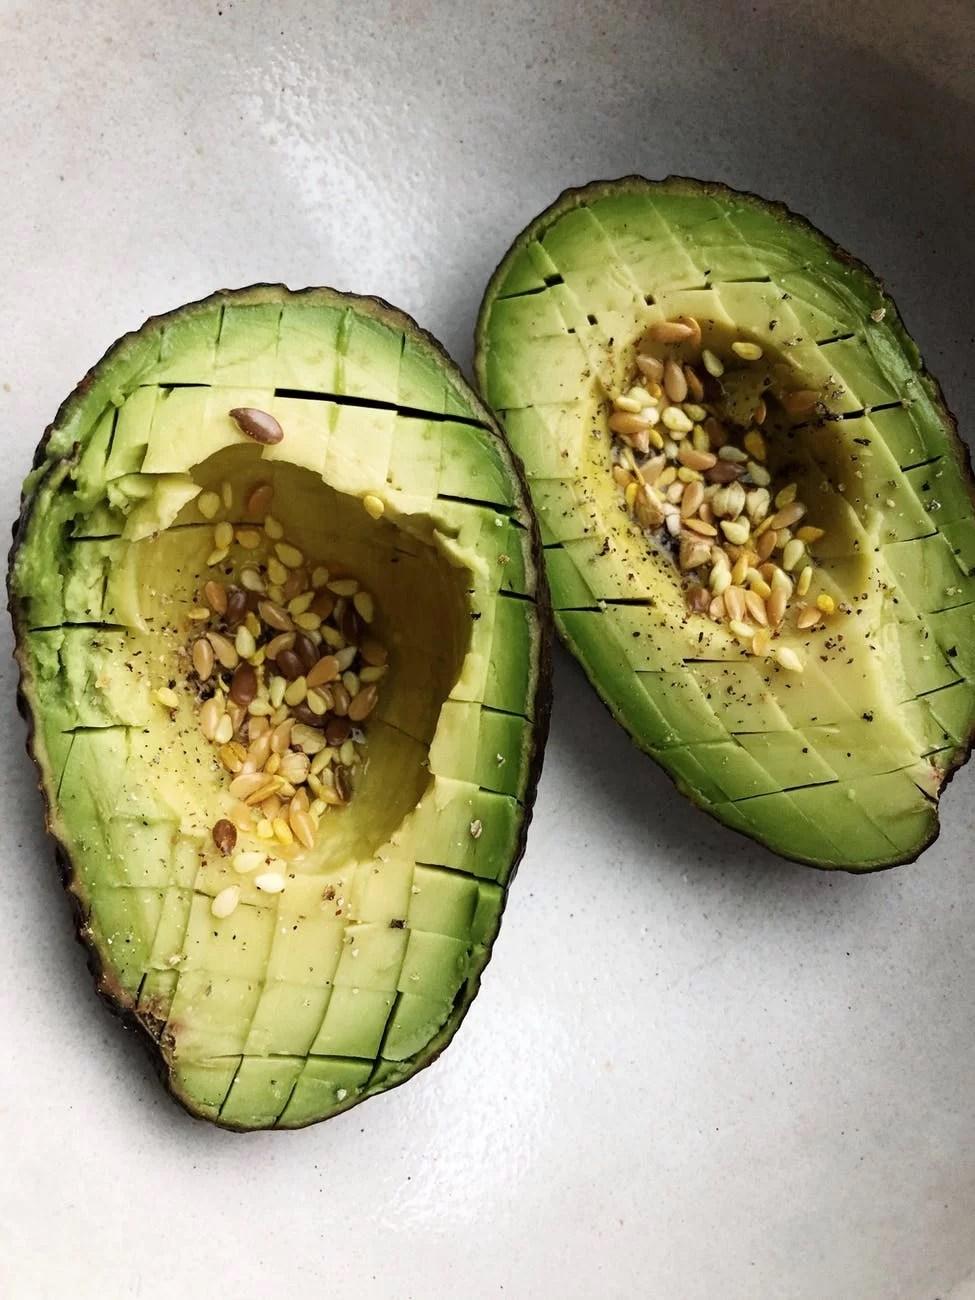 Diet+Avocados